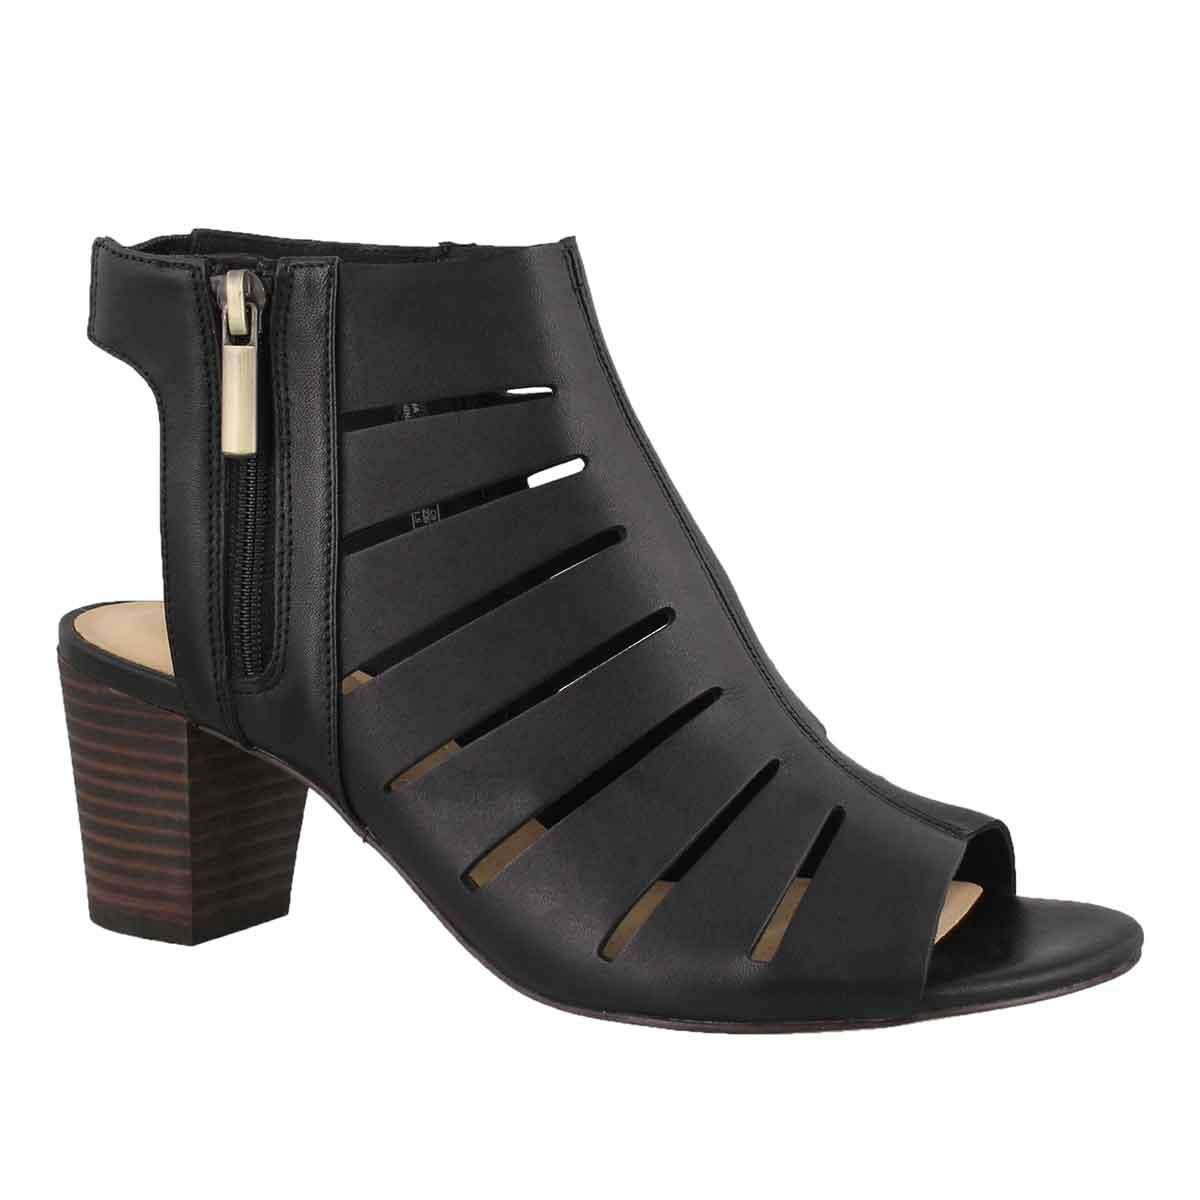 Women's DELORIA IVY black dress sandal